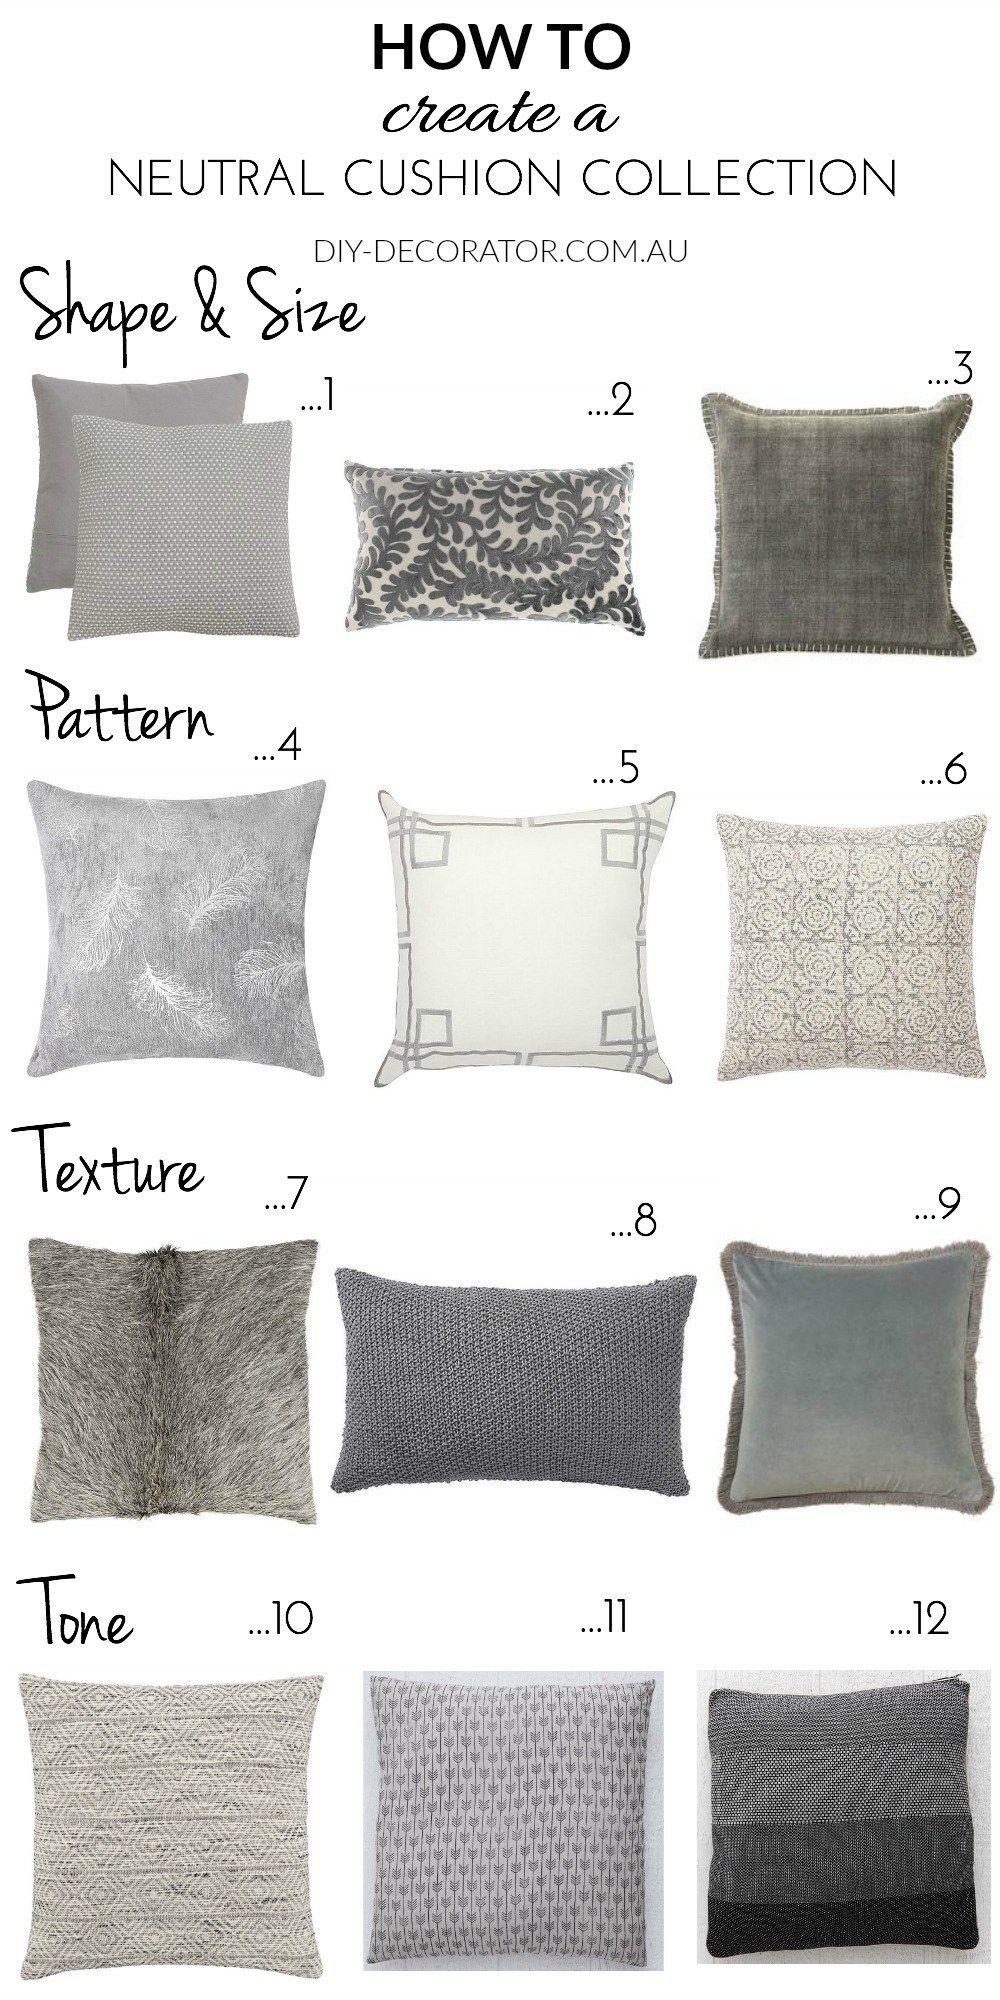 How To Create A Neutral Cushion Collection Diy Decorator Neutral Cushions Sofa Cushions Arrangement Cushions On Sofa